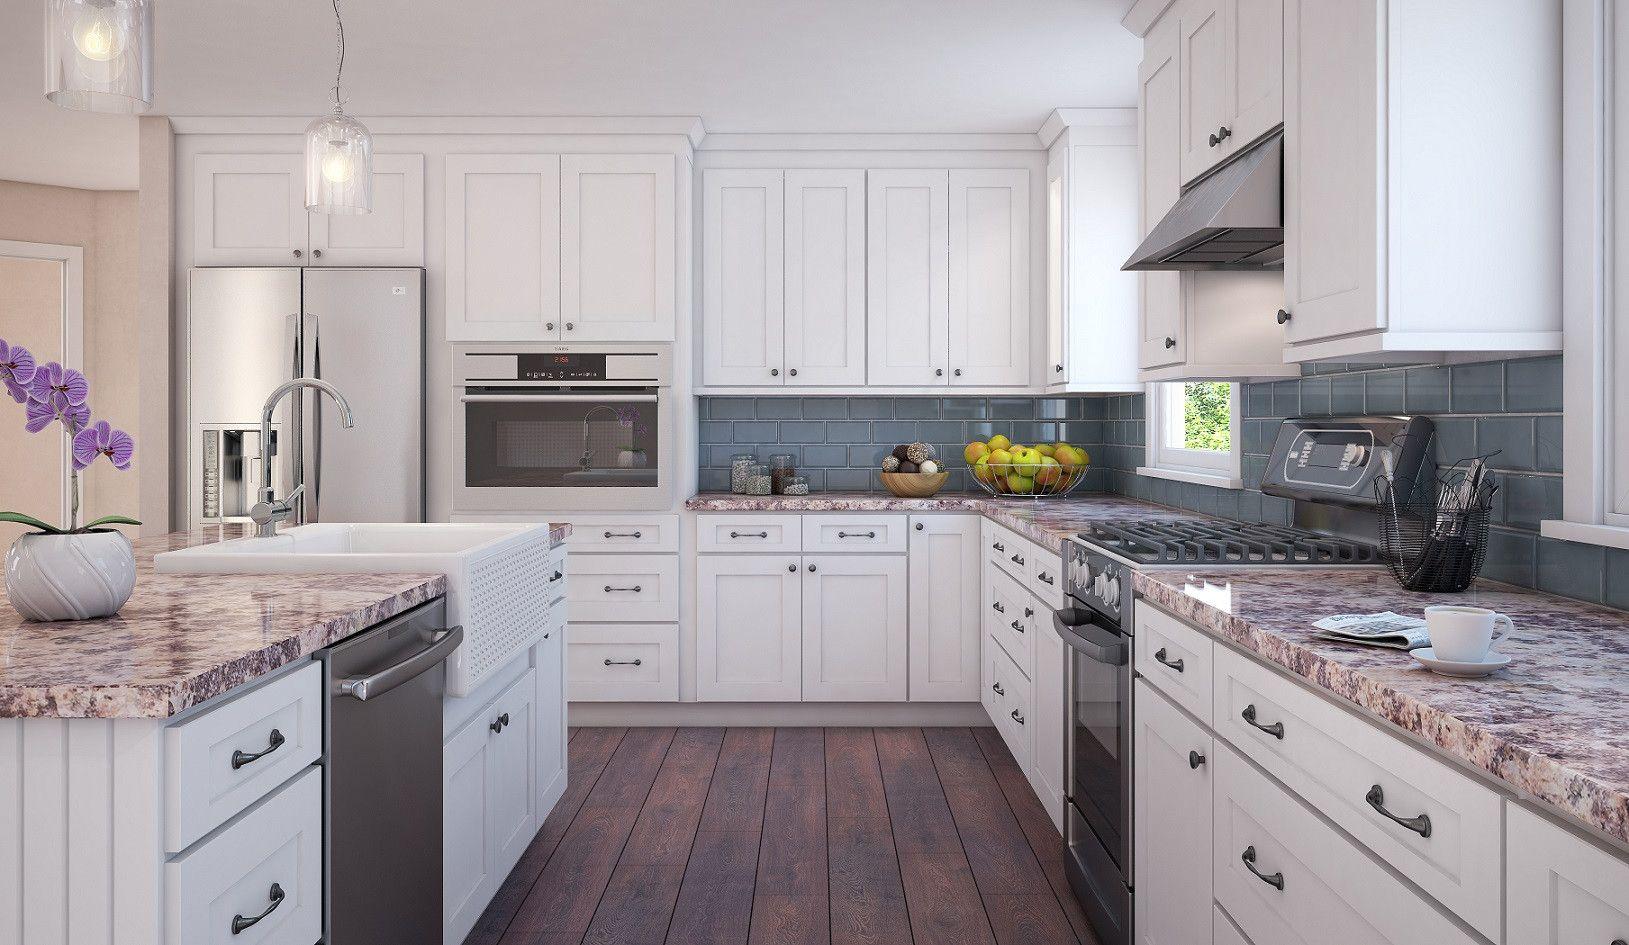 70+ Rta Cabinets White Shaker - Kitchen Cabinet Lighting Ideas Check ...